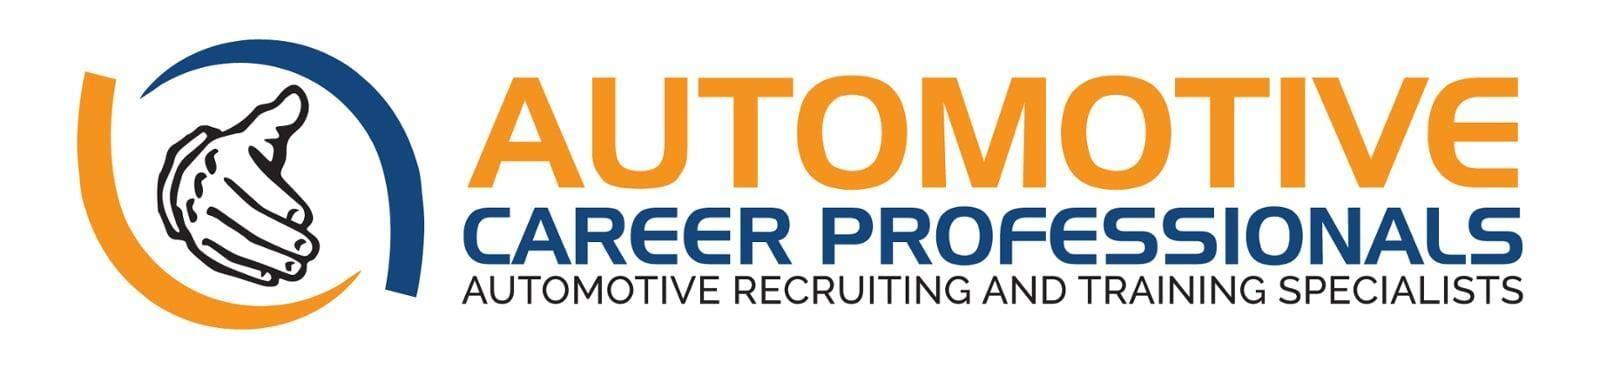 Automotive Career Professionals